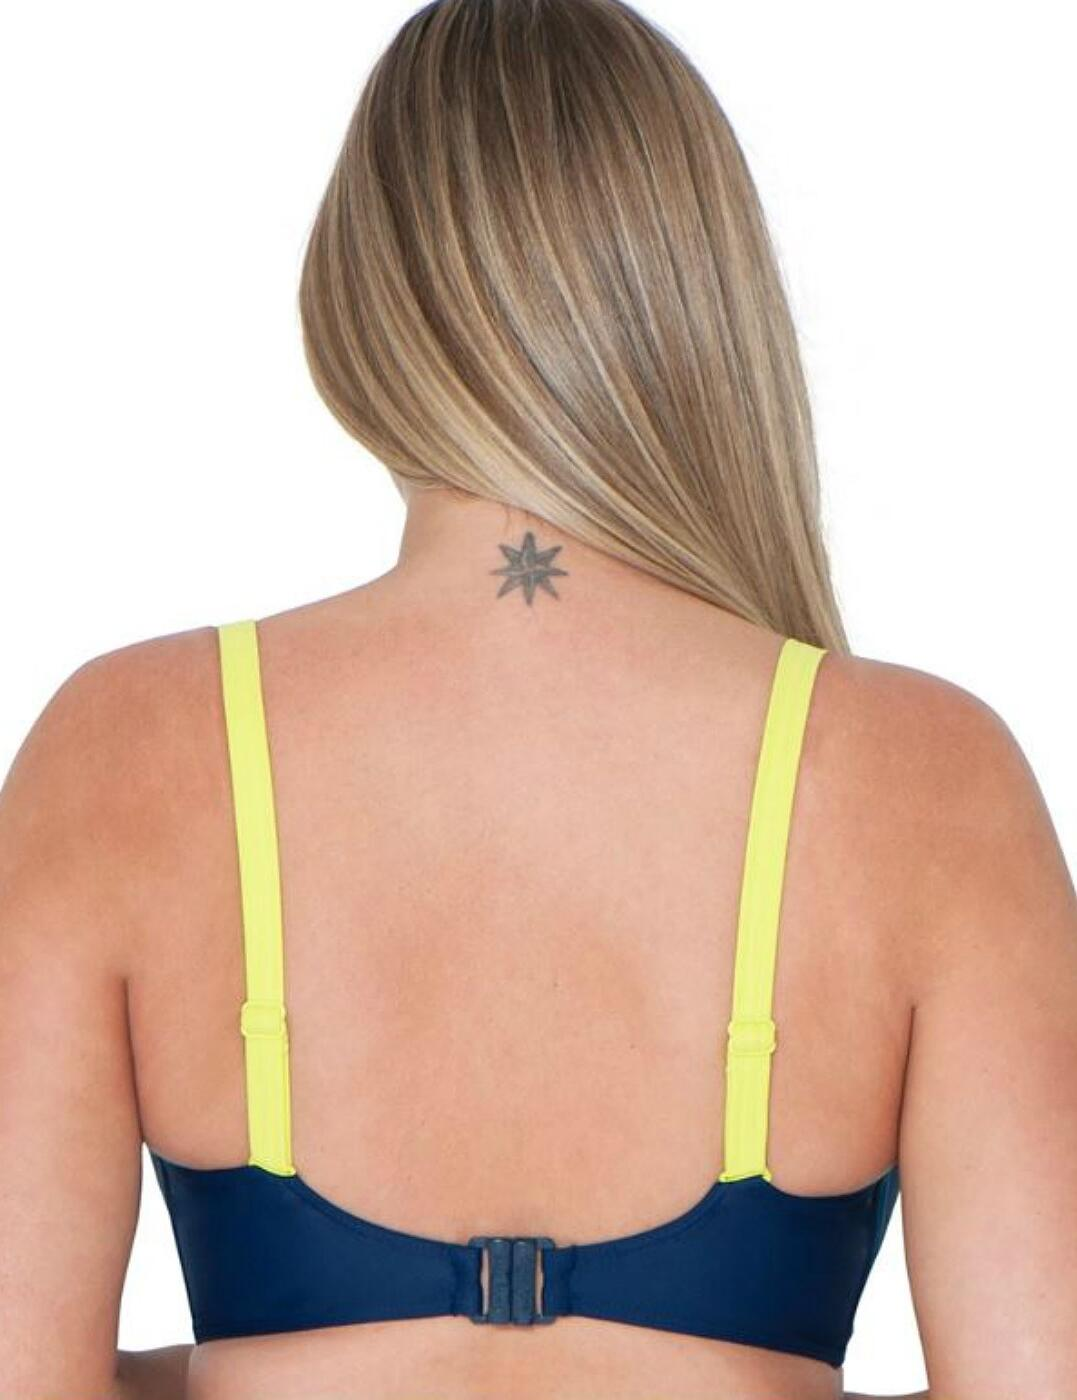 Curvy-Kate-Maya-Bikini-Top-Underwired-Balcony-CS4611-New-Womens-Swimwear thumbnail 4